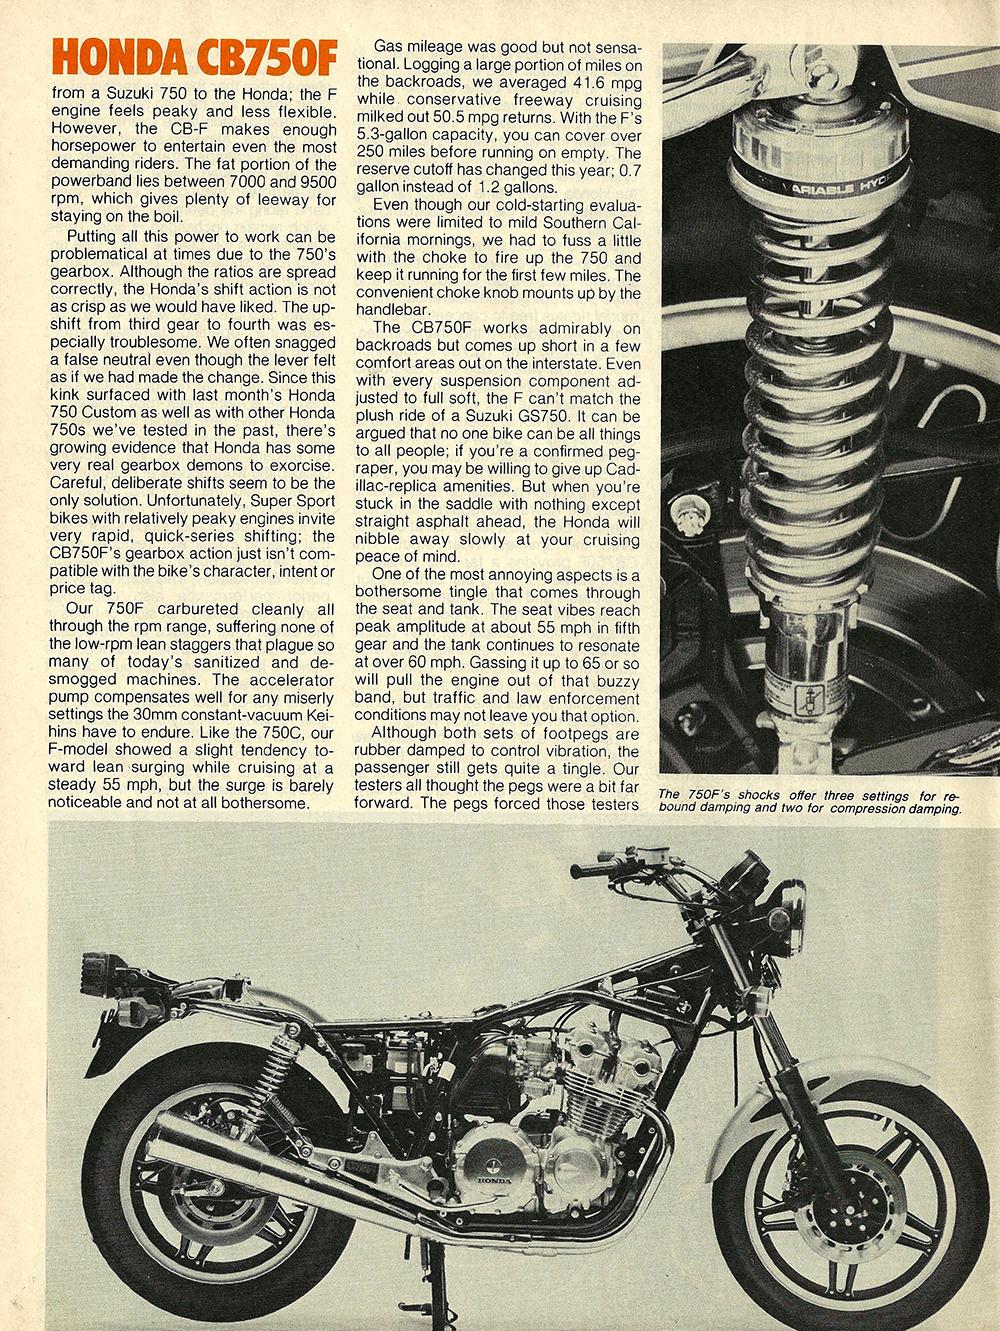 1980 Honda CB750F road test 05.jpg